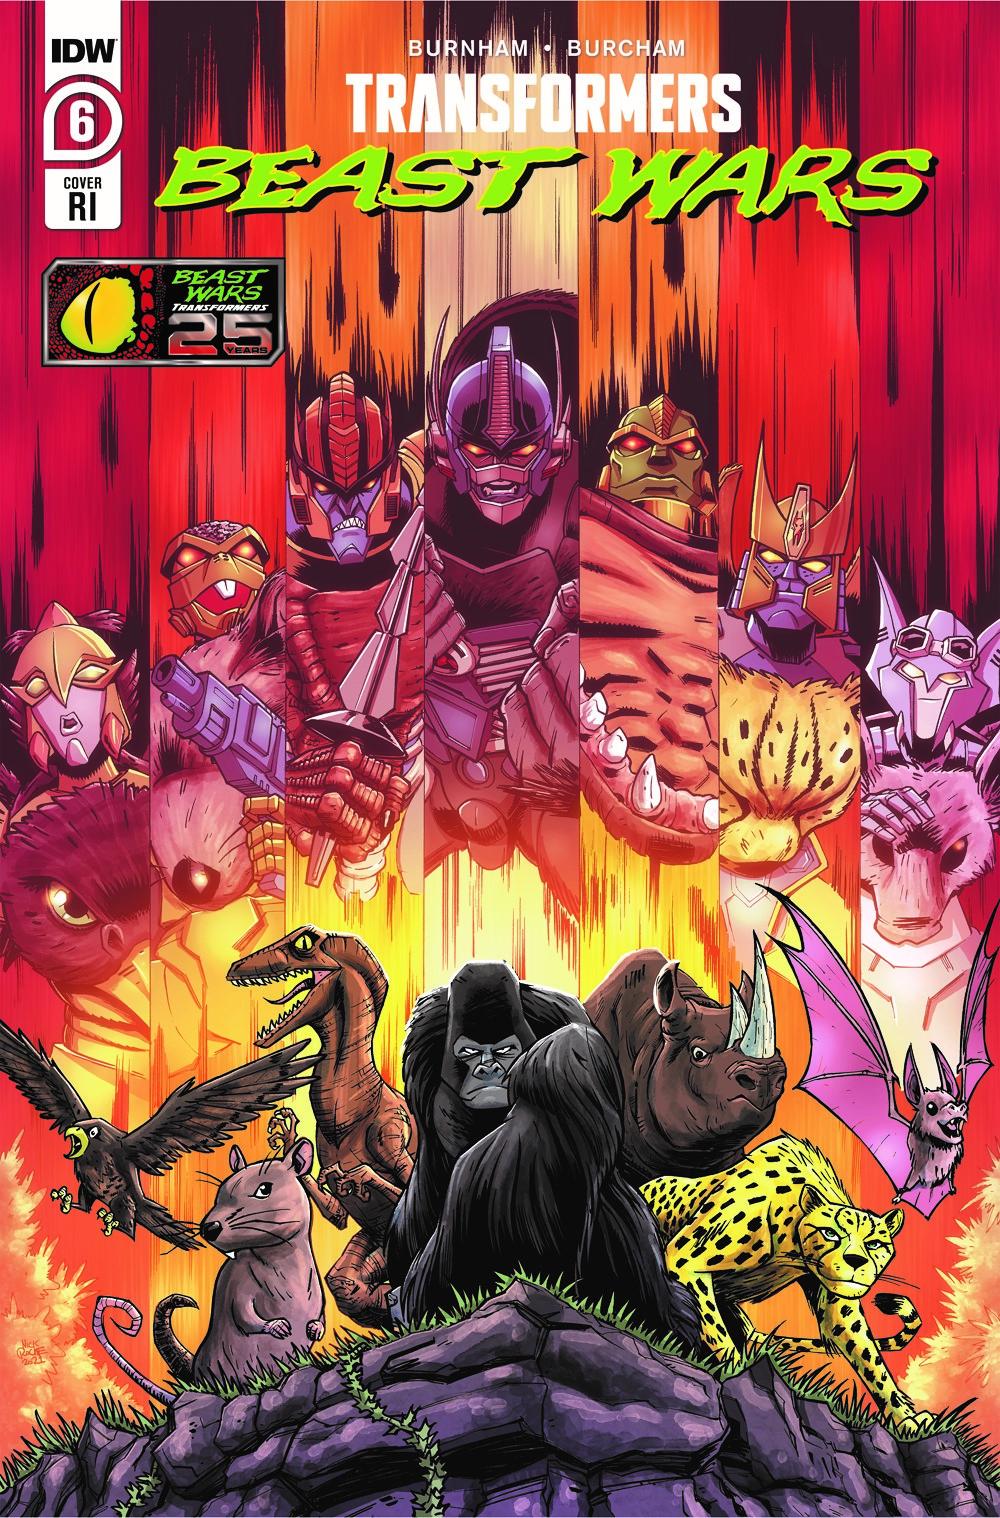 TFBW06-Cover-RI ComicList Previews: TRANSFORMERS BEAST WARS #6